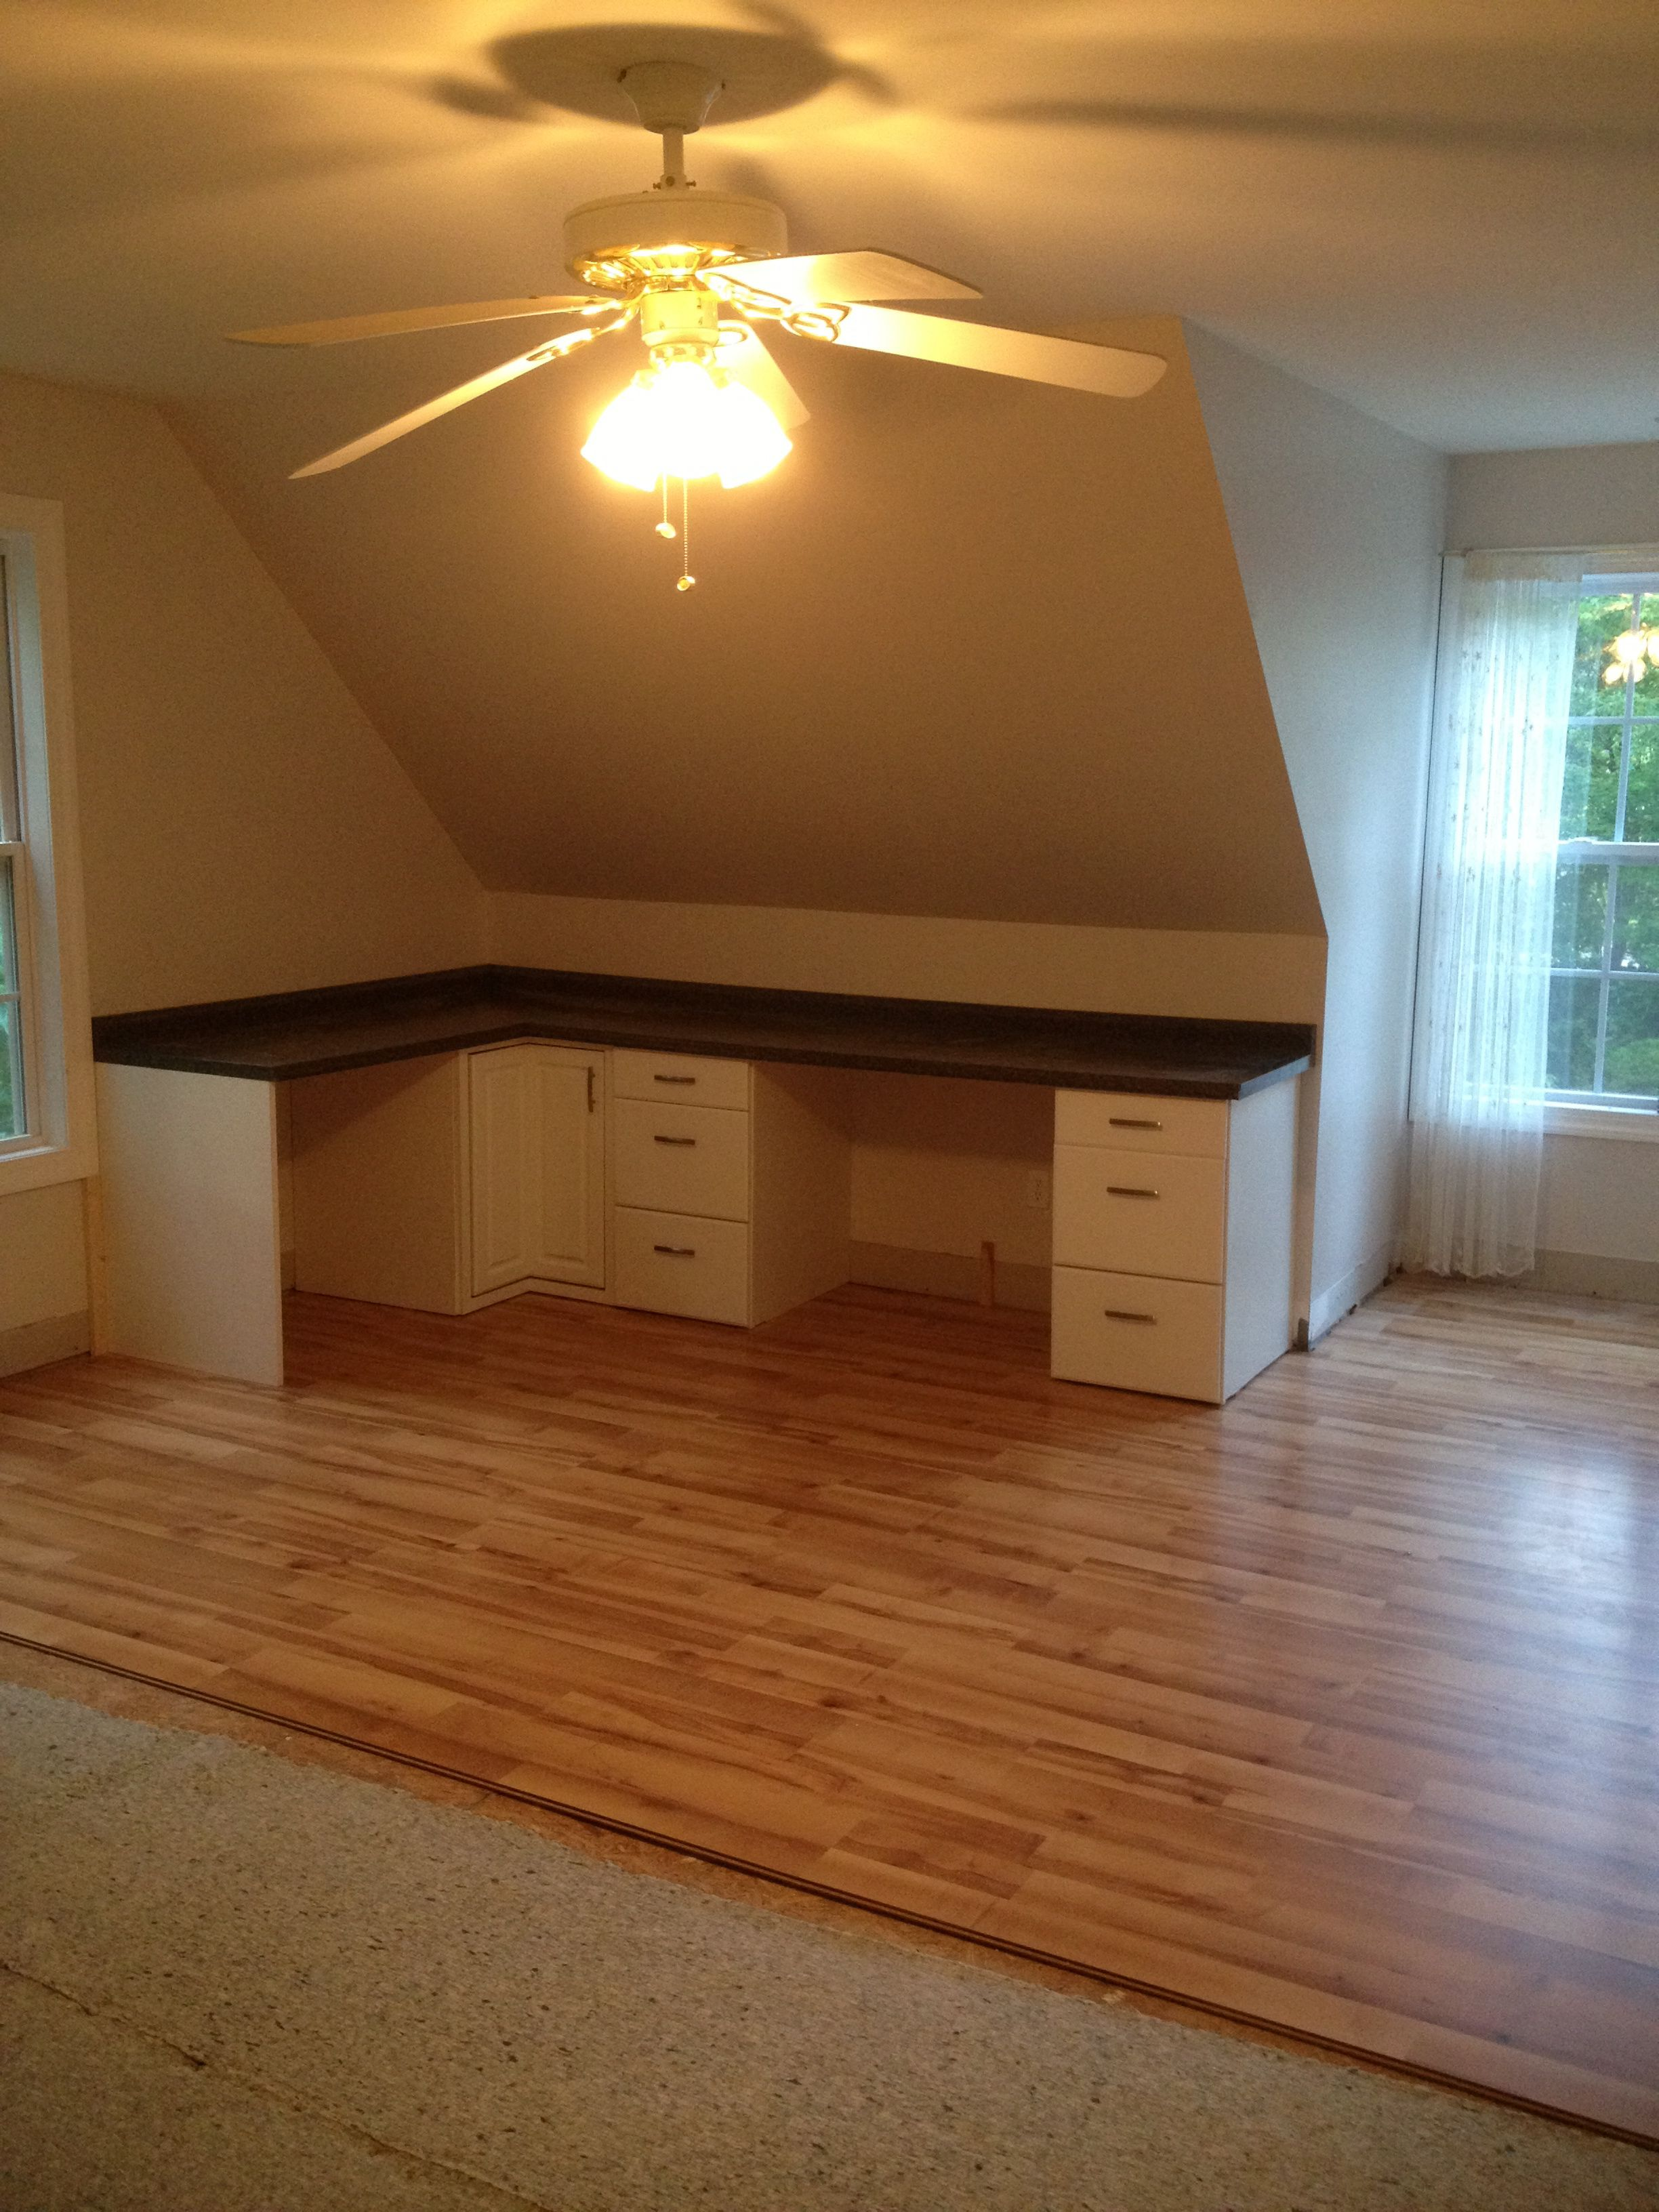 Built in desk and laminate floors Attic renovation